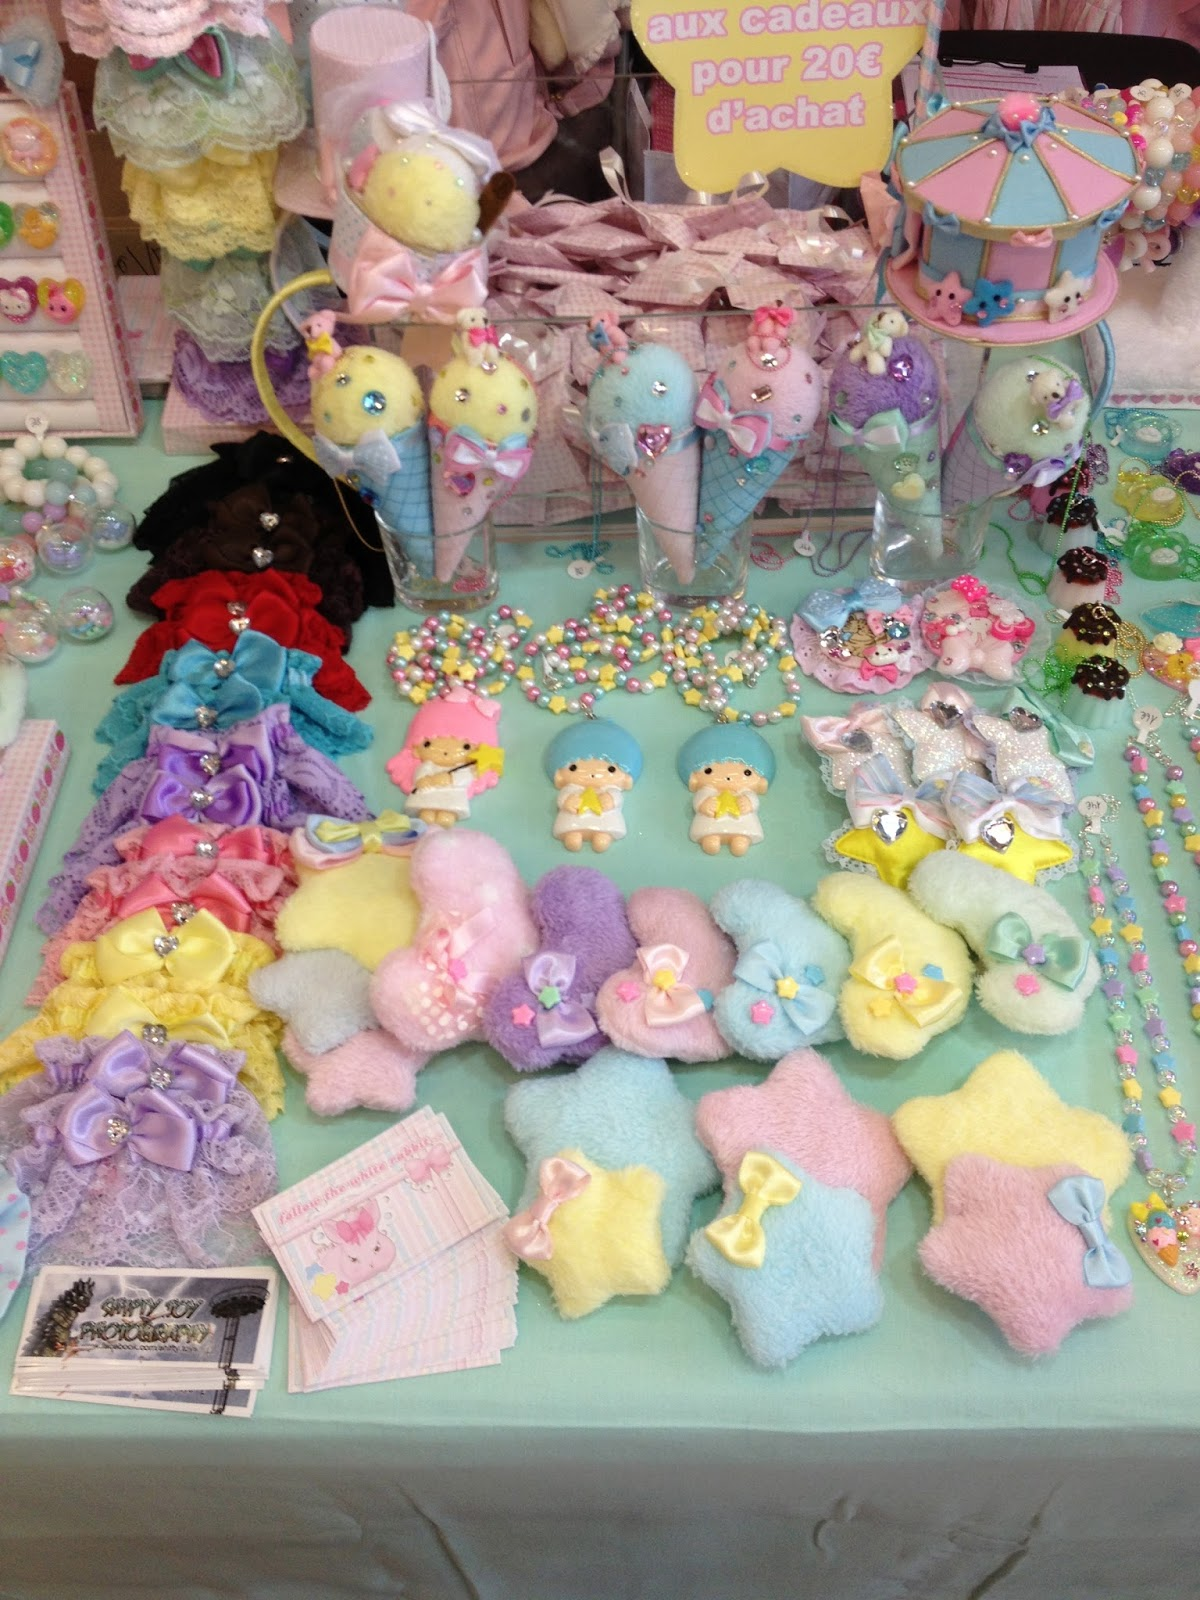 Stunning Chambre Japonaise Kawaii Ideas - ansomone.us - ansomone.us